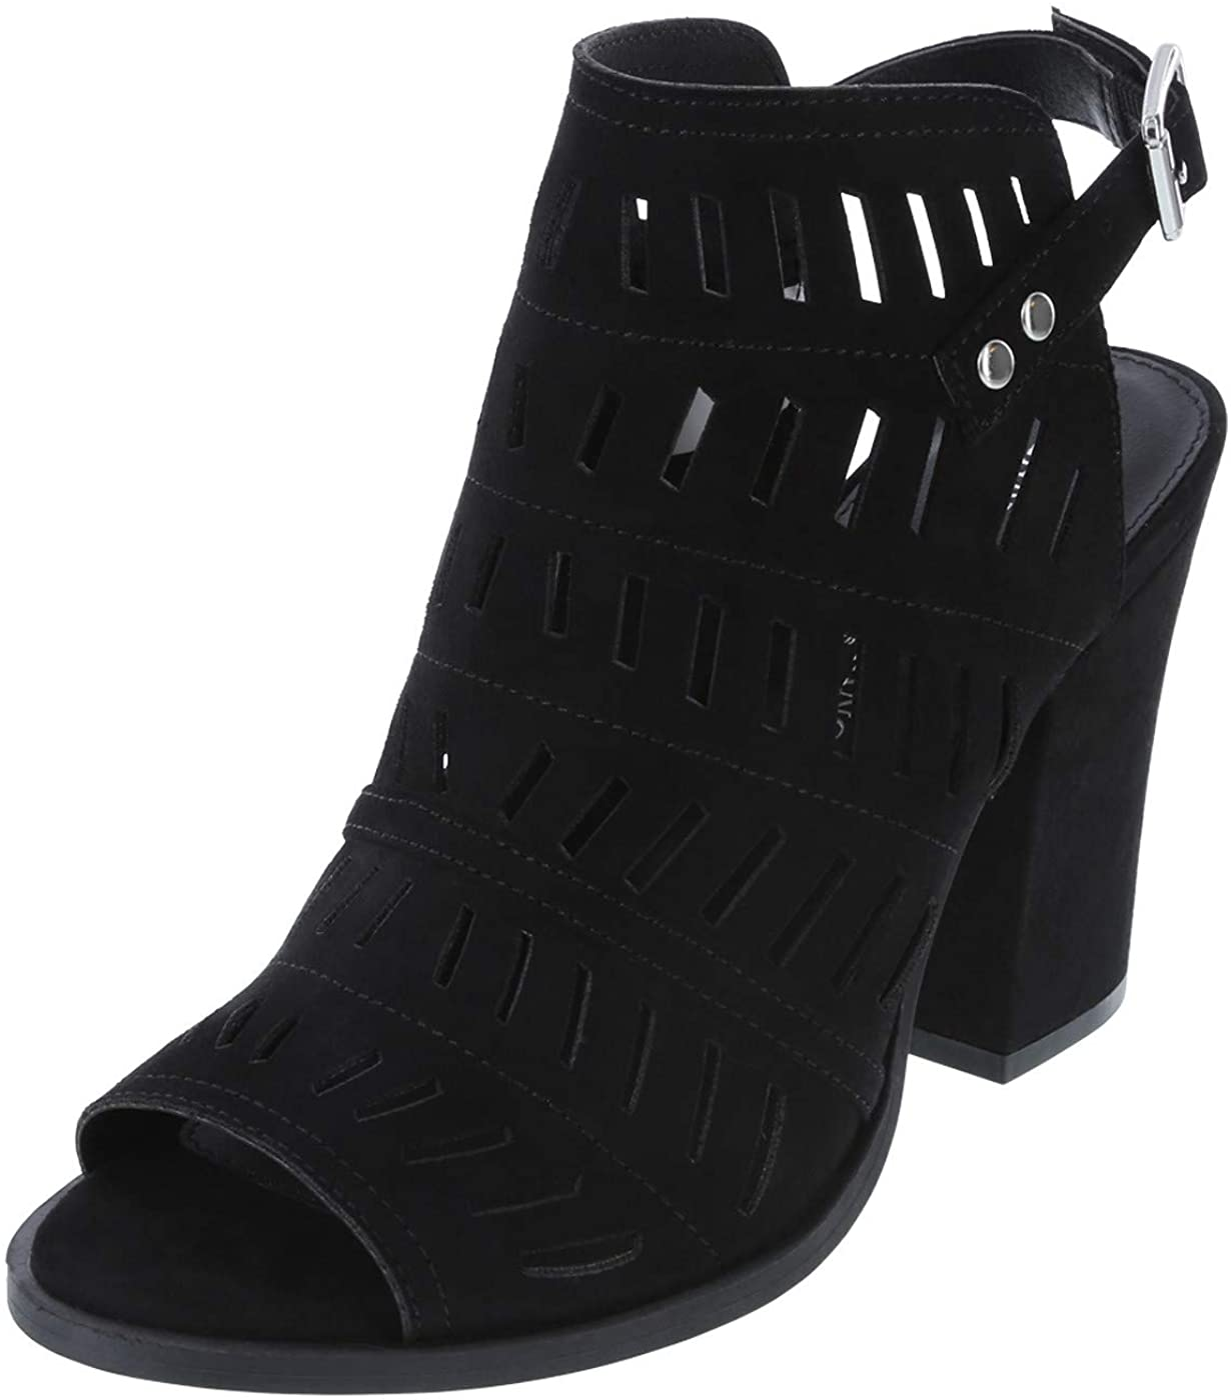 Christian Siriano for Payless Women's Winter Block Heel Sandal